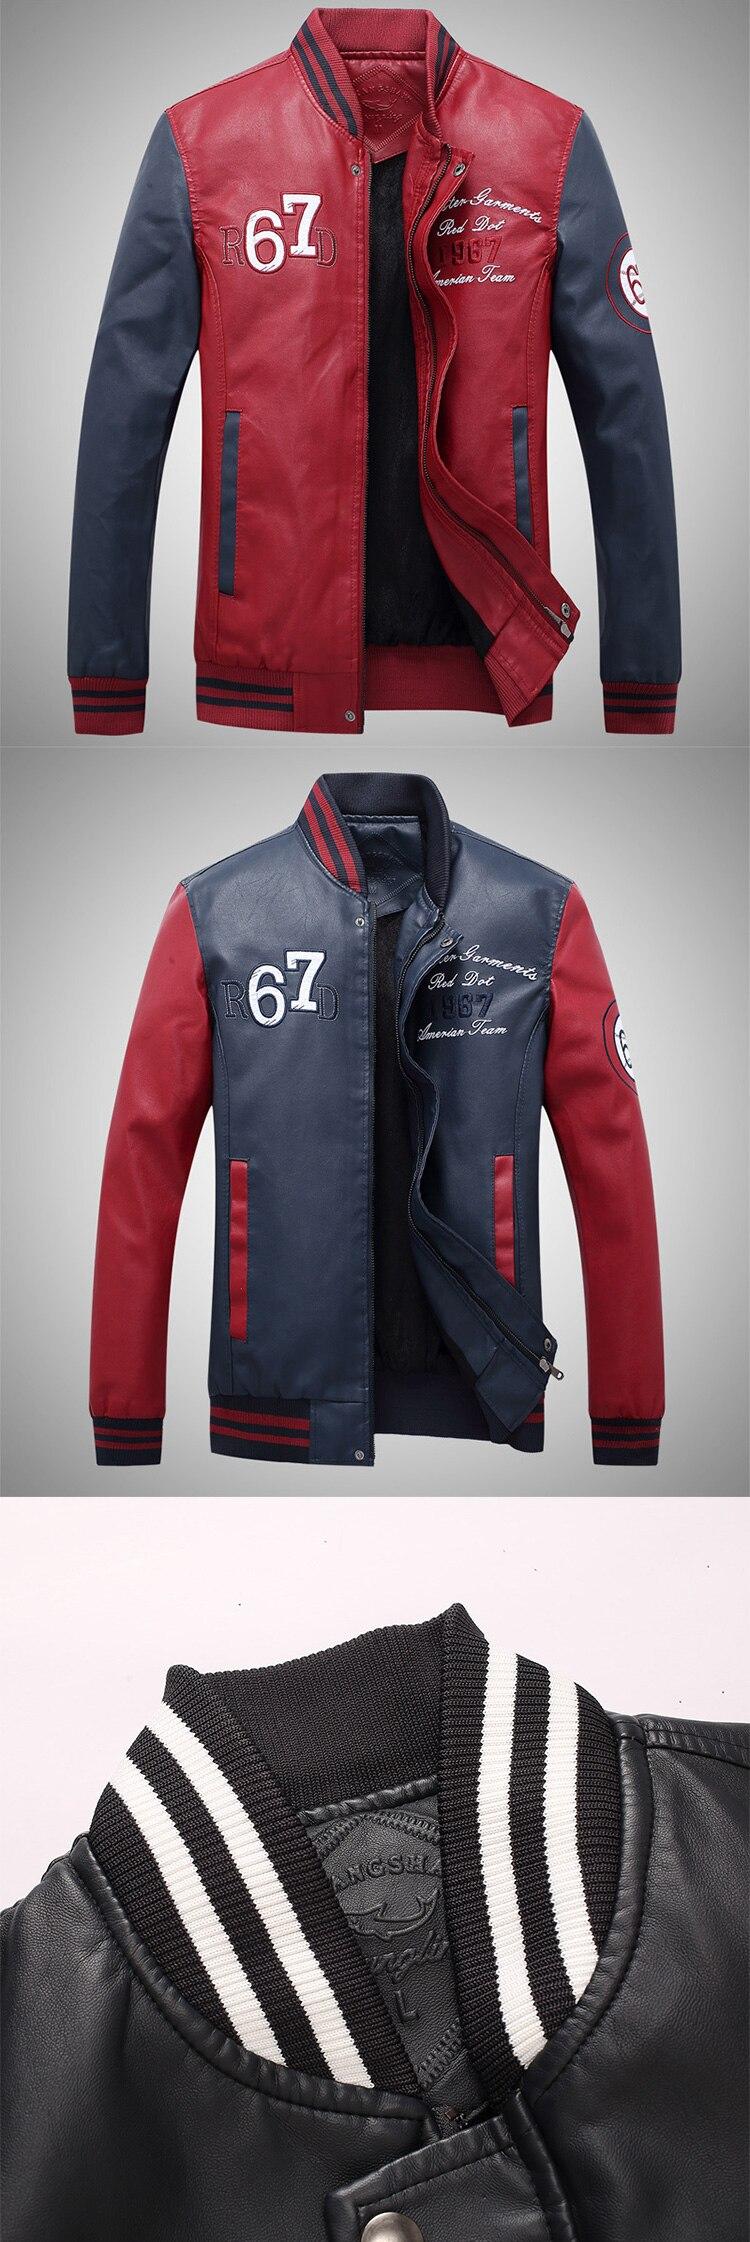 HTB14V GbG5s3KVjSZFNq6AD3FXaB New Men Pu Faux Leather Jacket 2019 Brand Embroidery Baseball Jackets Male Casual Luxury Winter Warm Fleece Pilot Bomber Coat